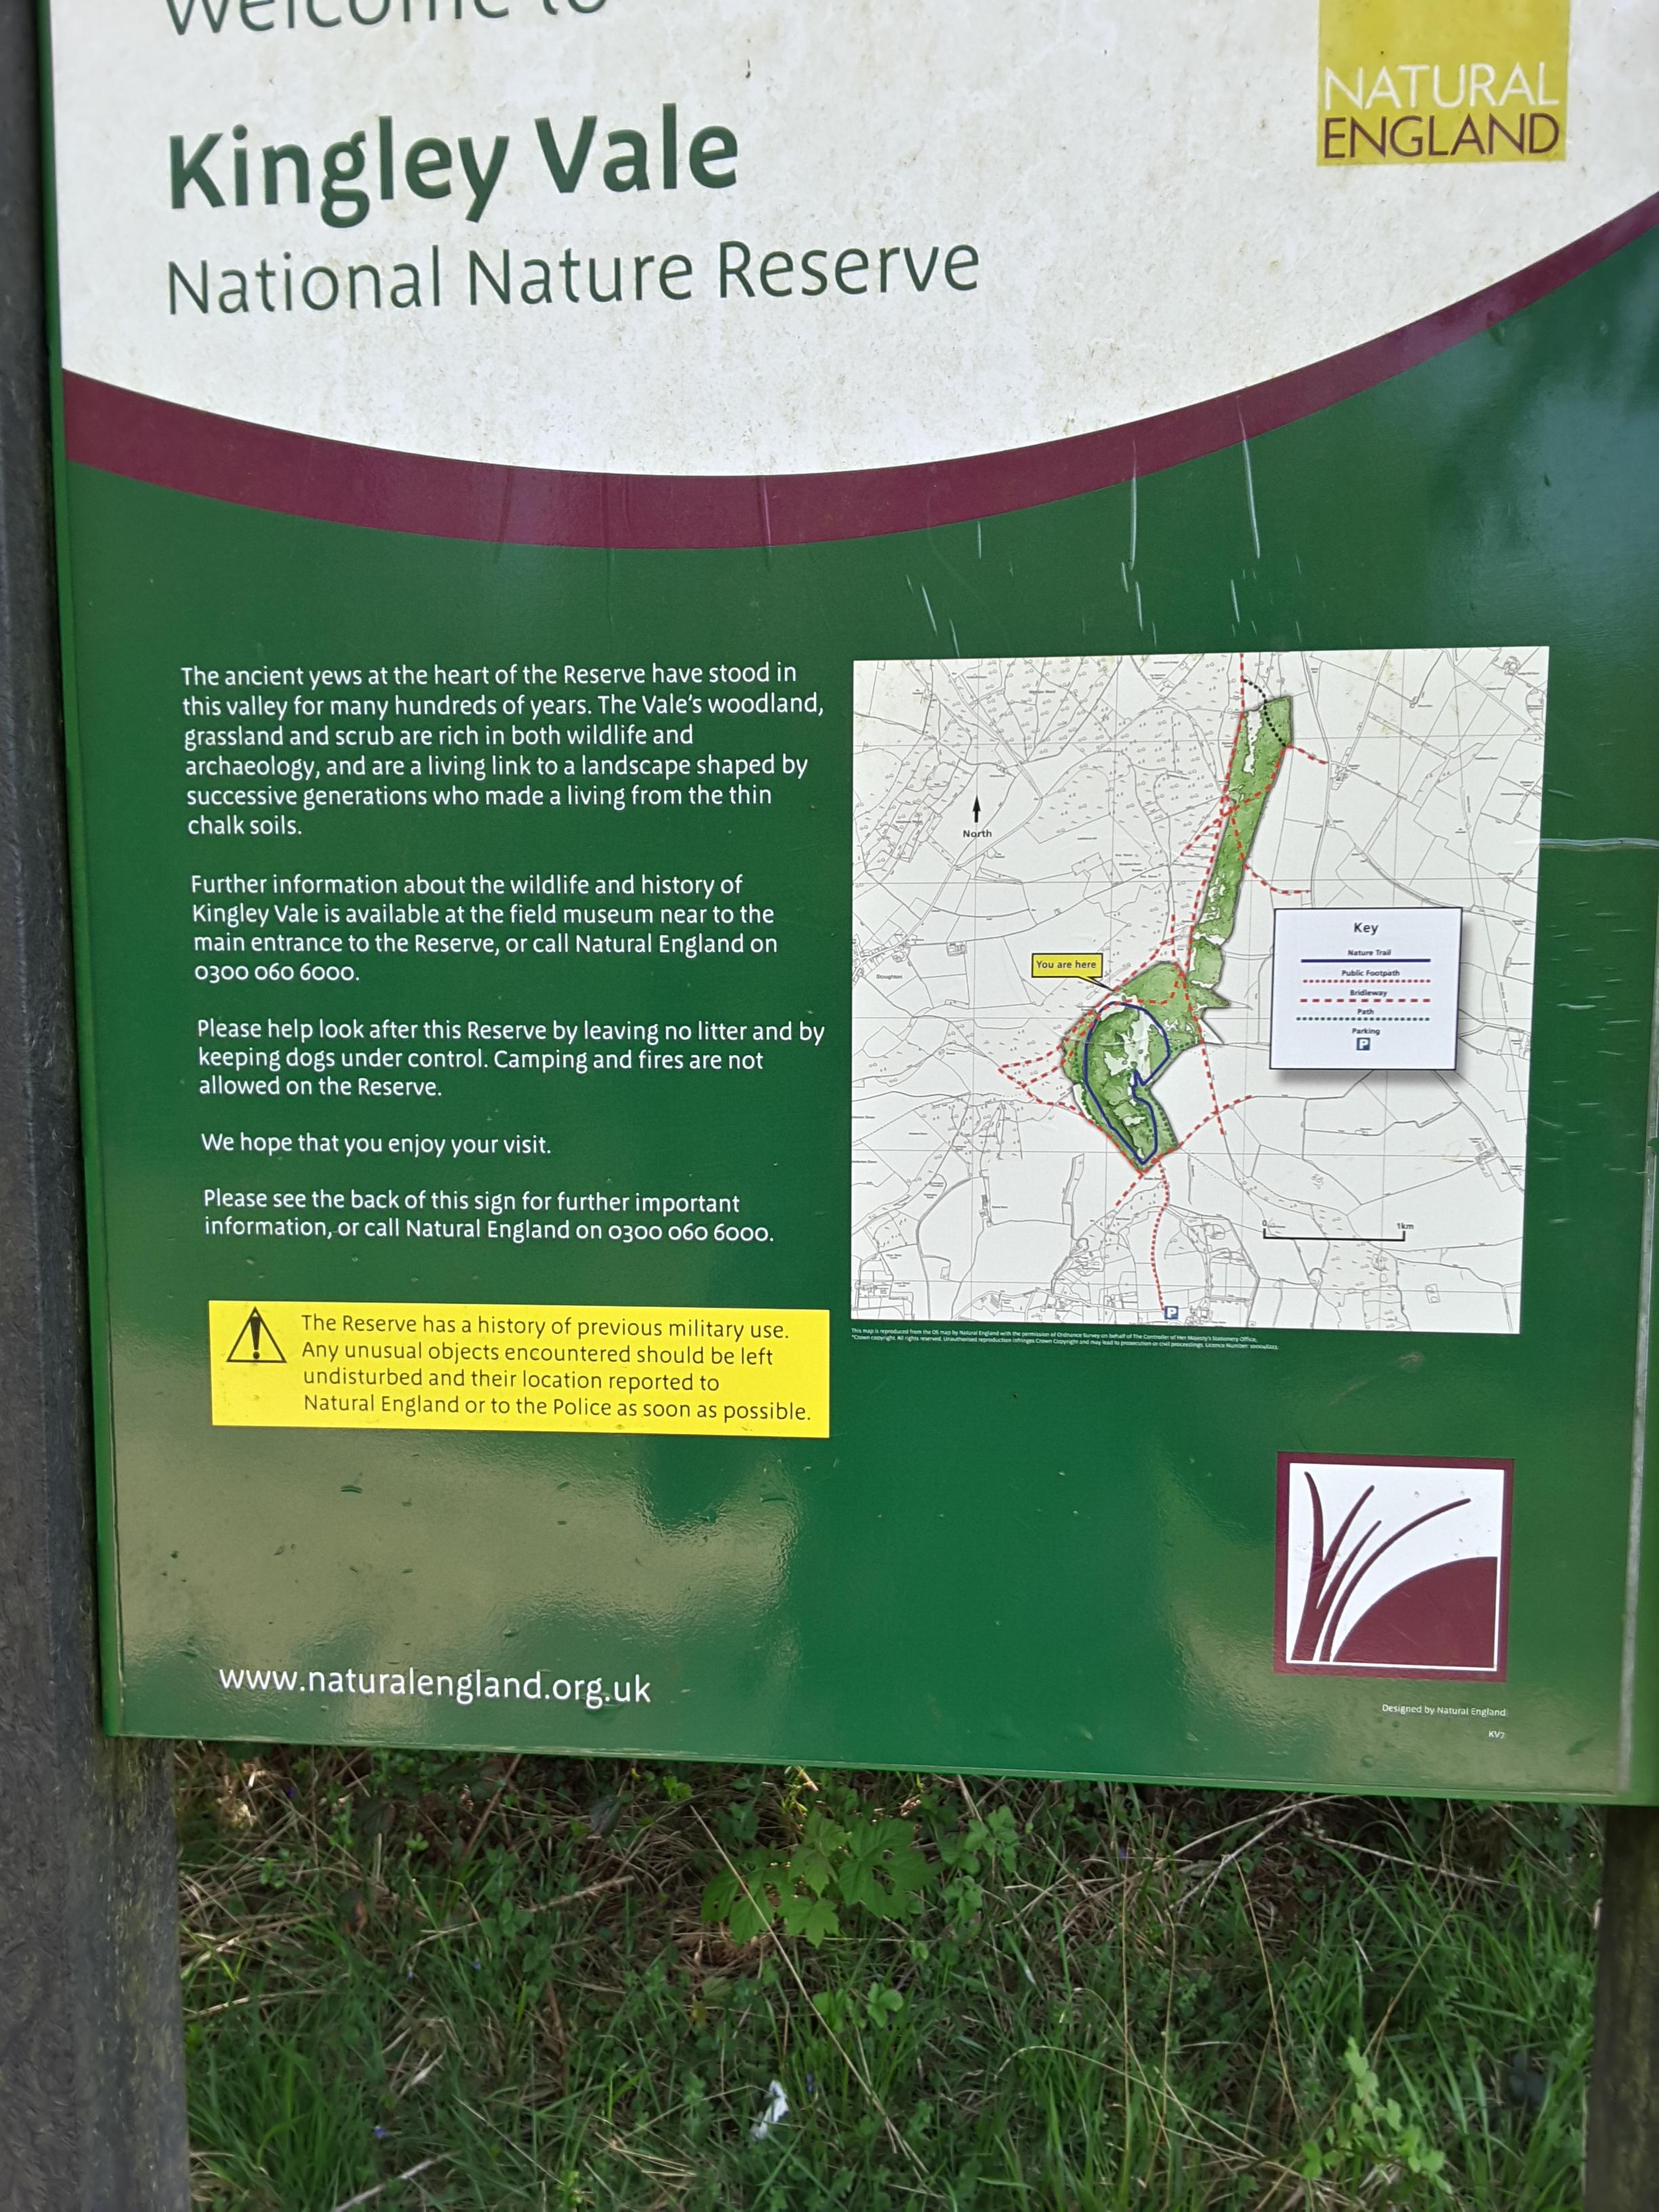 2016.05.08 - Kingley Vale National Nature Reserve - 07